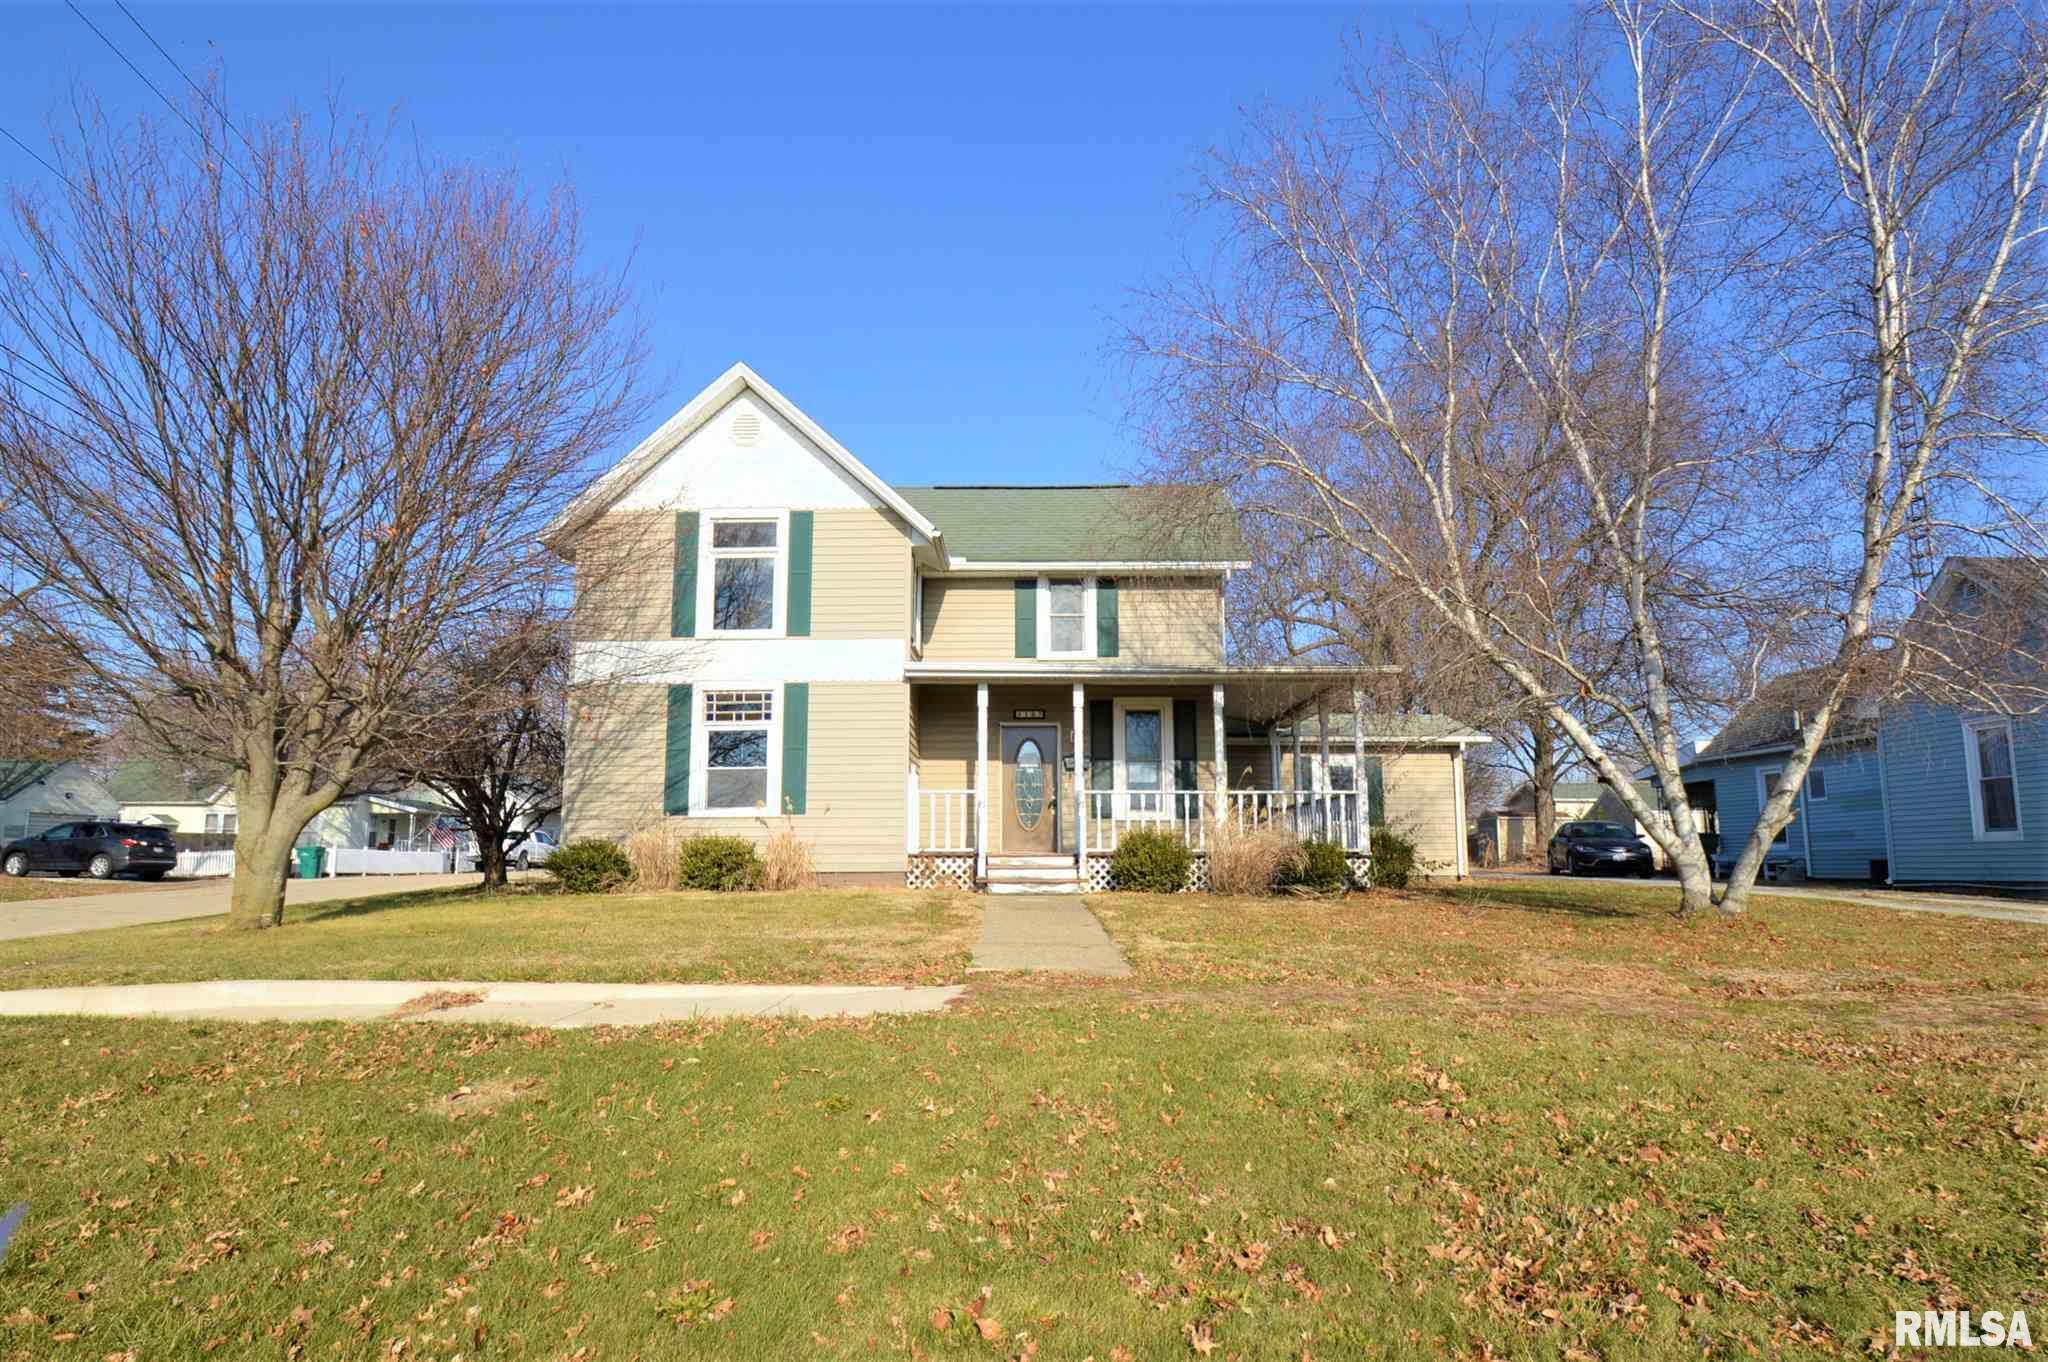 183 W FORT Property Photo - Farmington, IL real estate listing